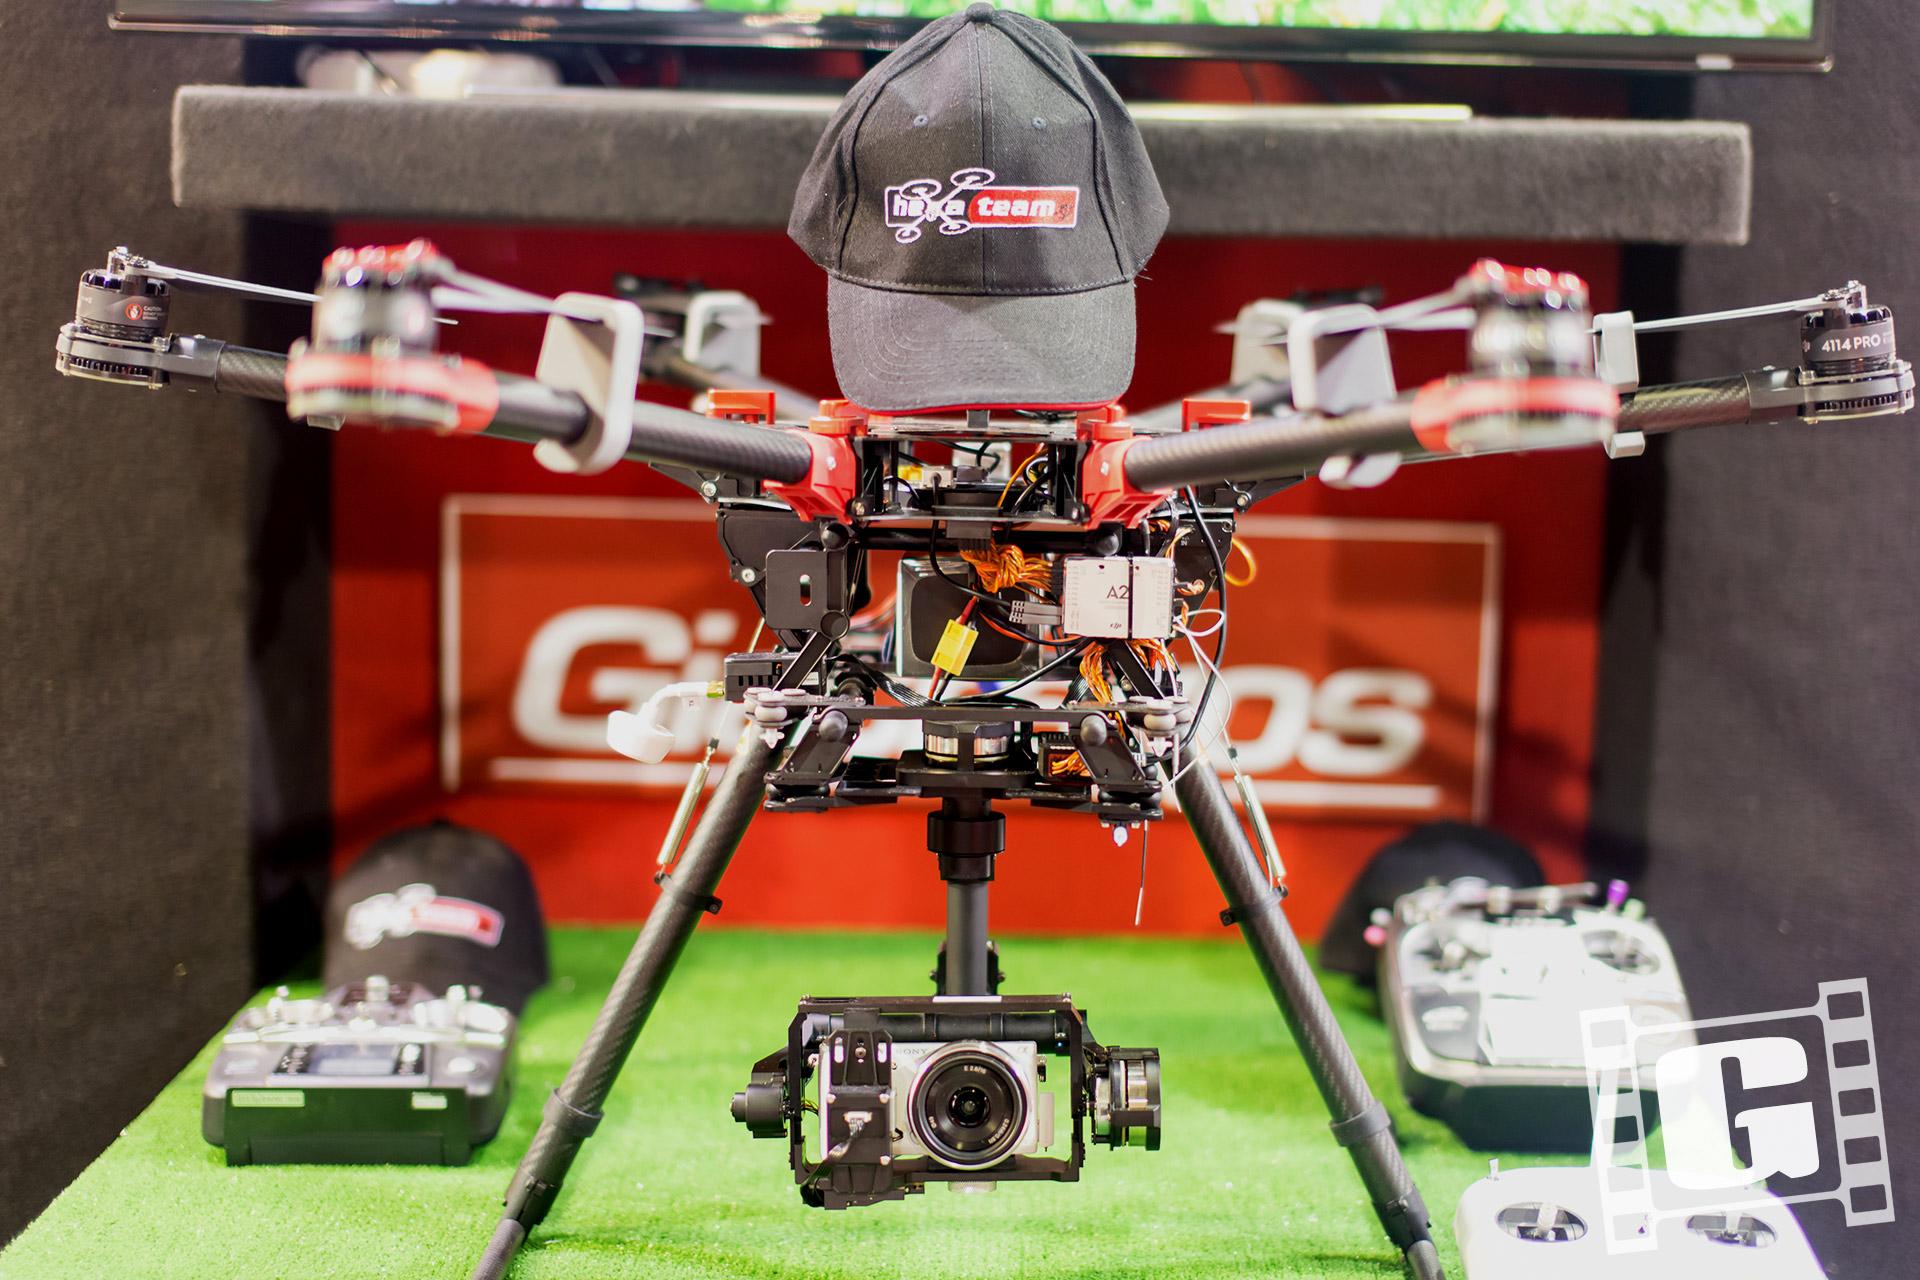 photovision 2015, drone, Greece, SMIEA, Giatrakos Chris, hexateam